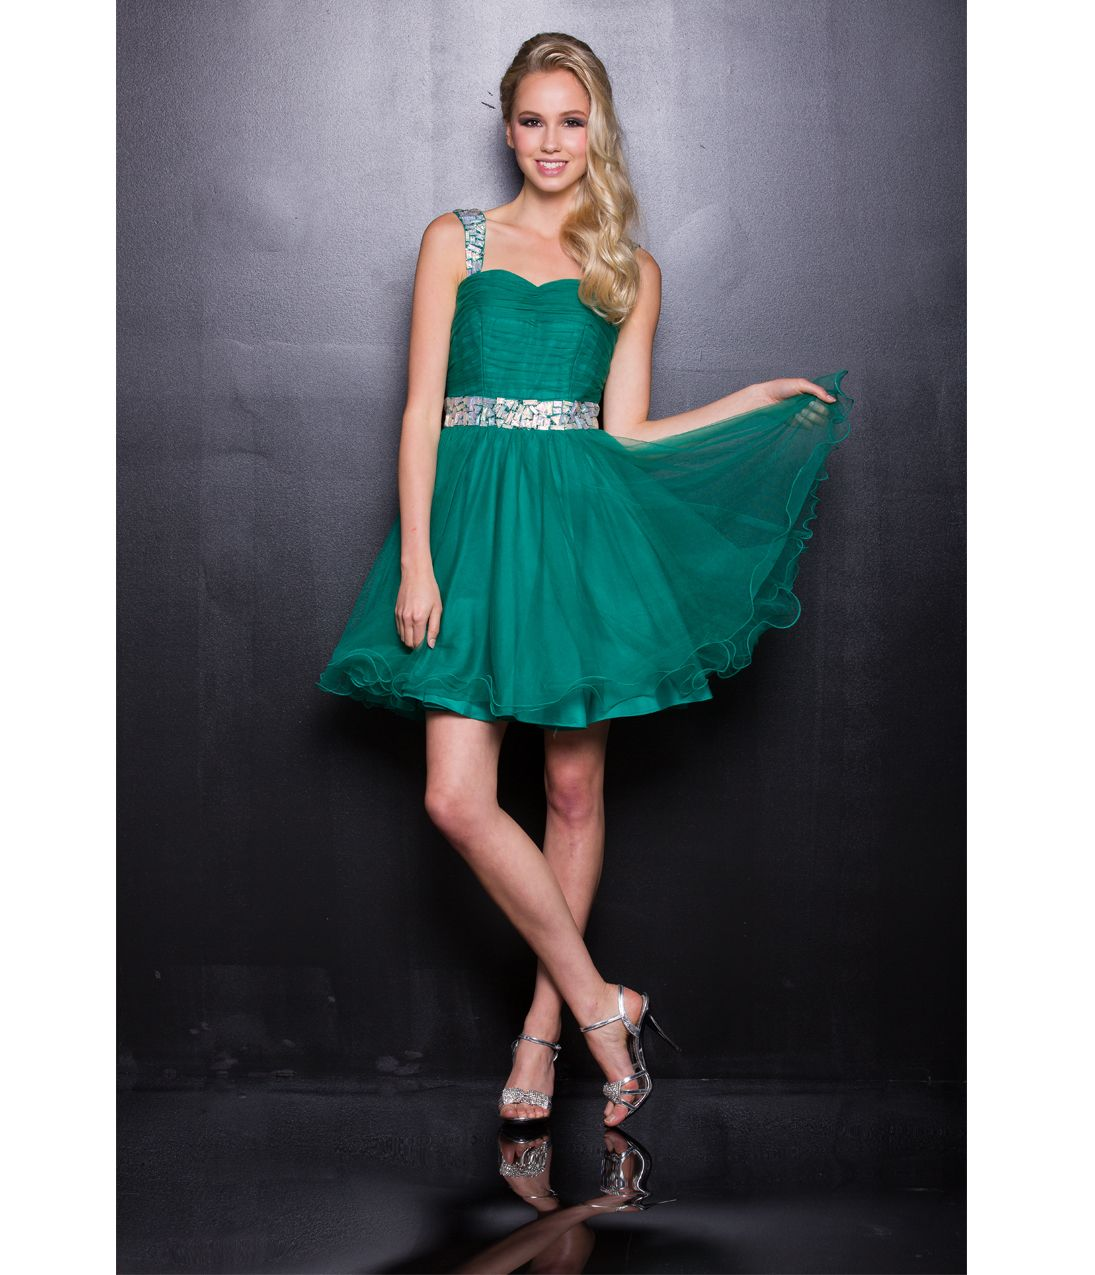 78 Best images about Short Prom Dresses on Pinterest  Satin ...